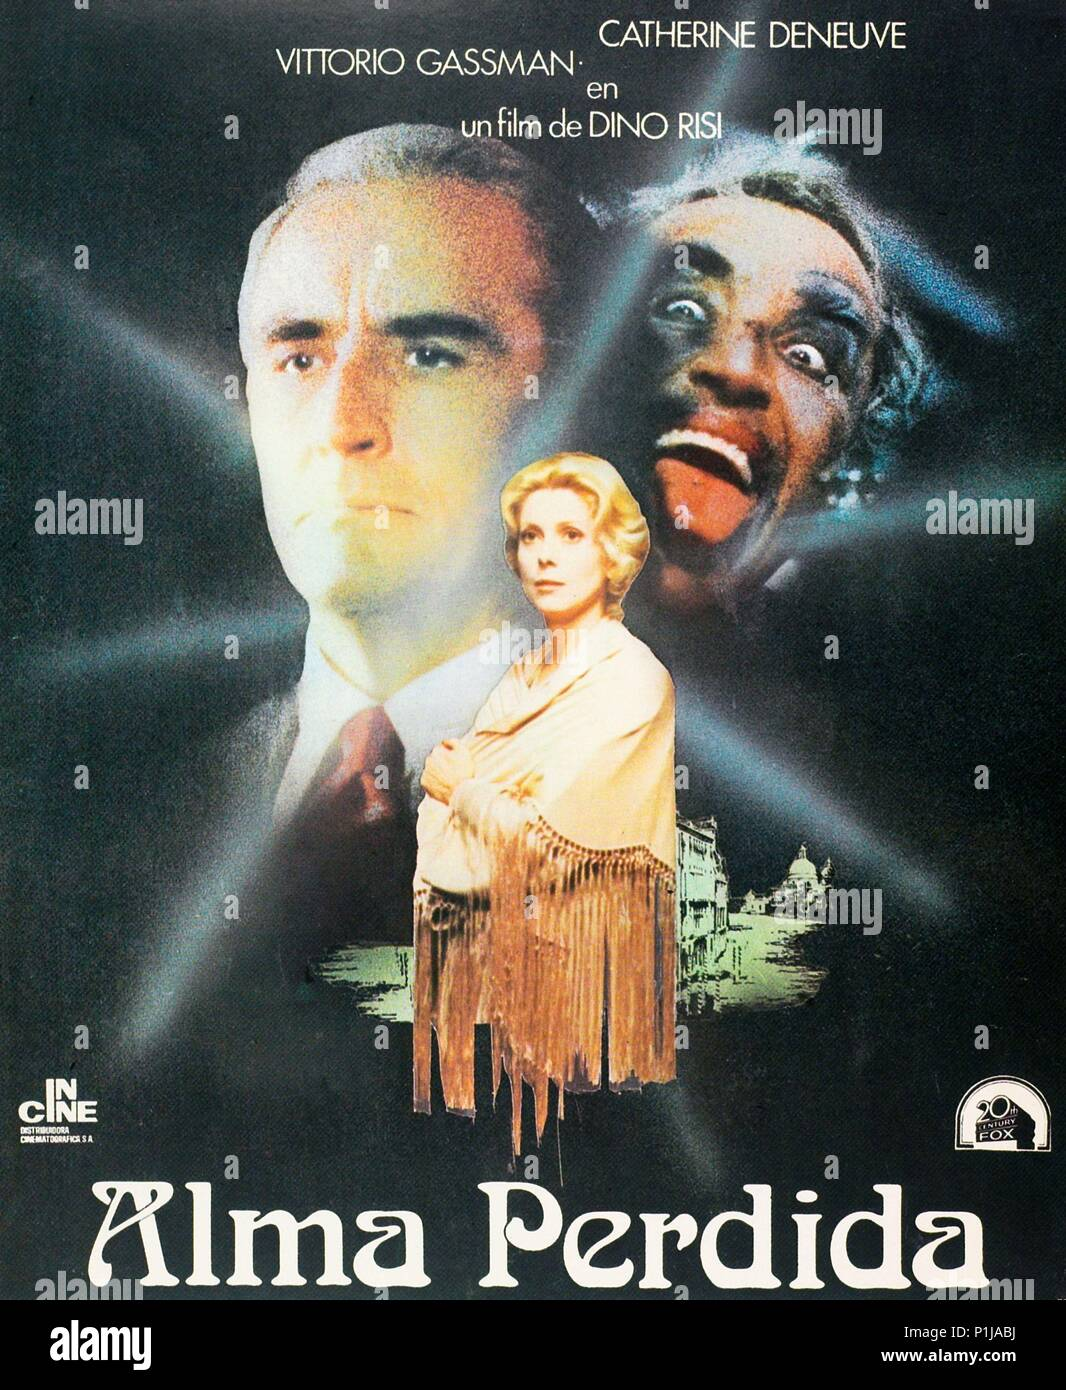 Anima Persa 1977 original film title: anima persa. english title: anima persa